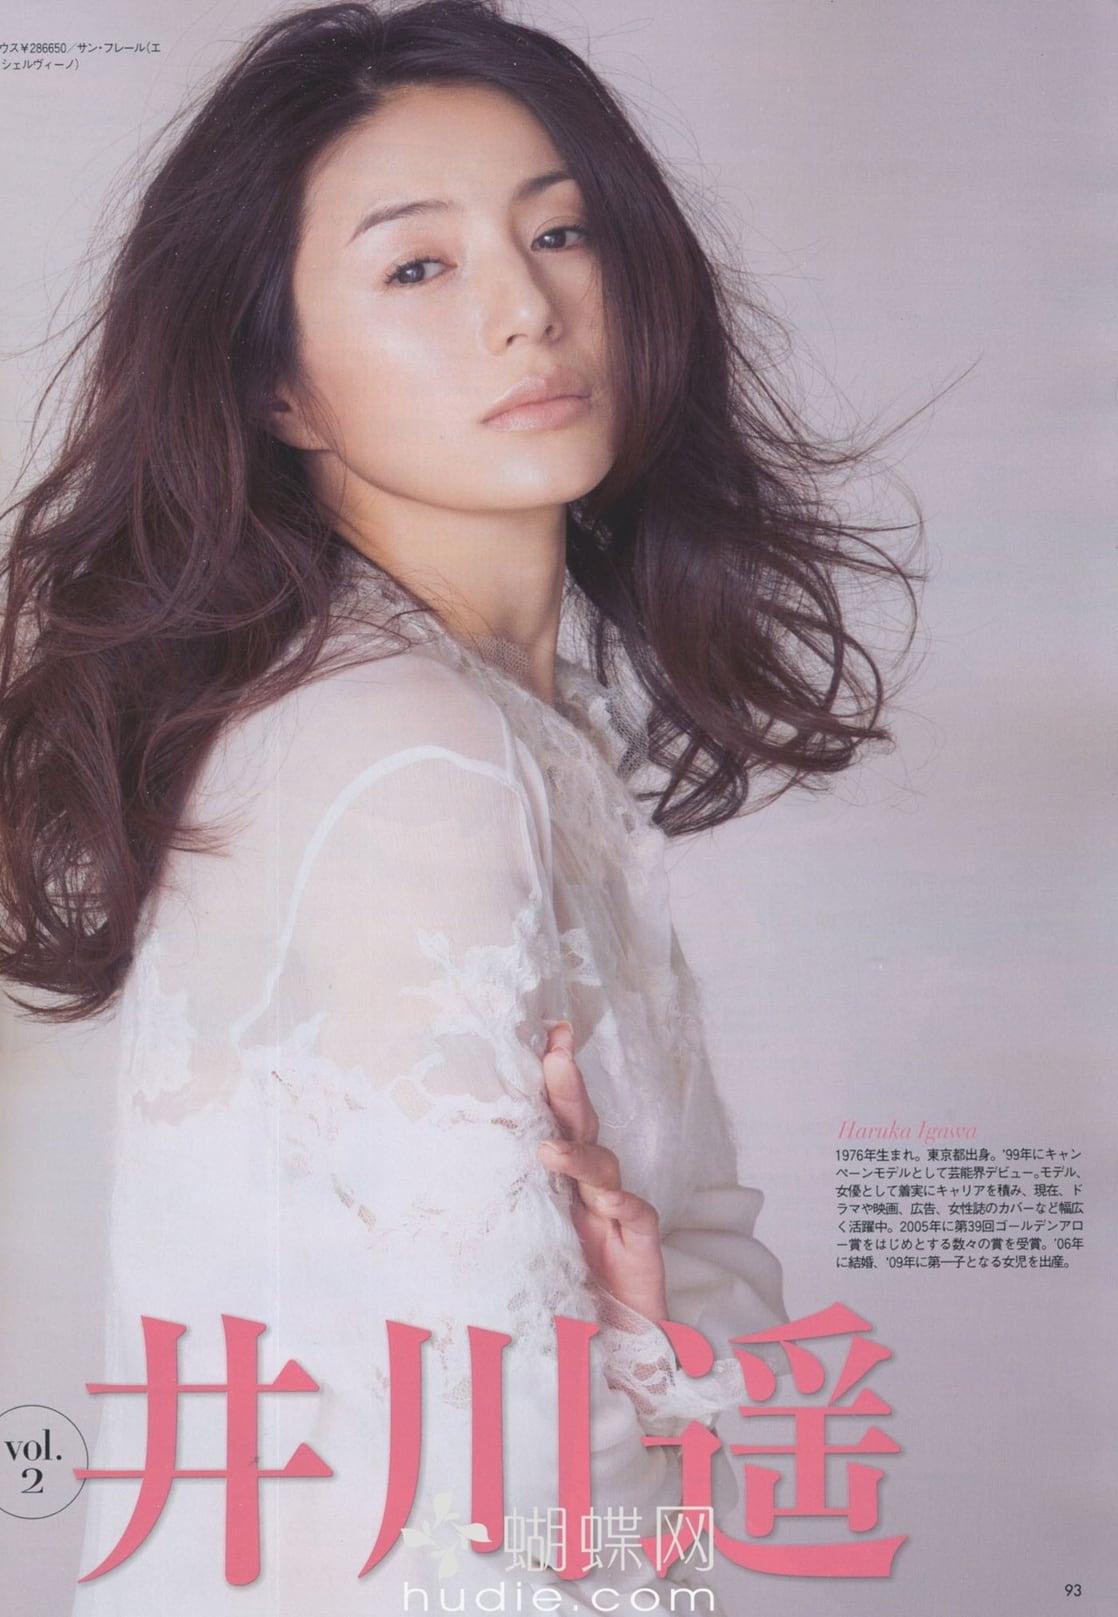 Haruka Igawa Nude Photos 37